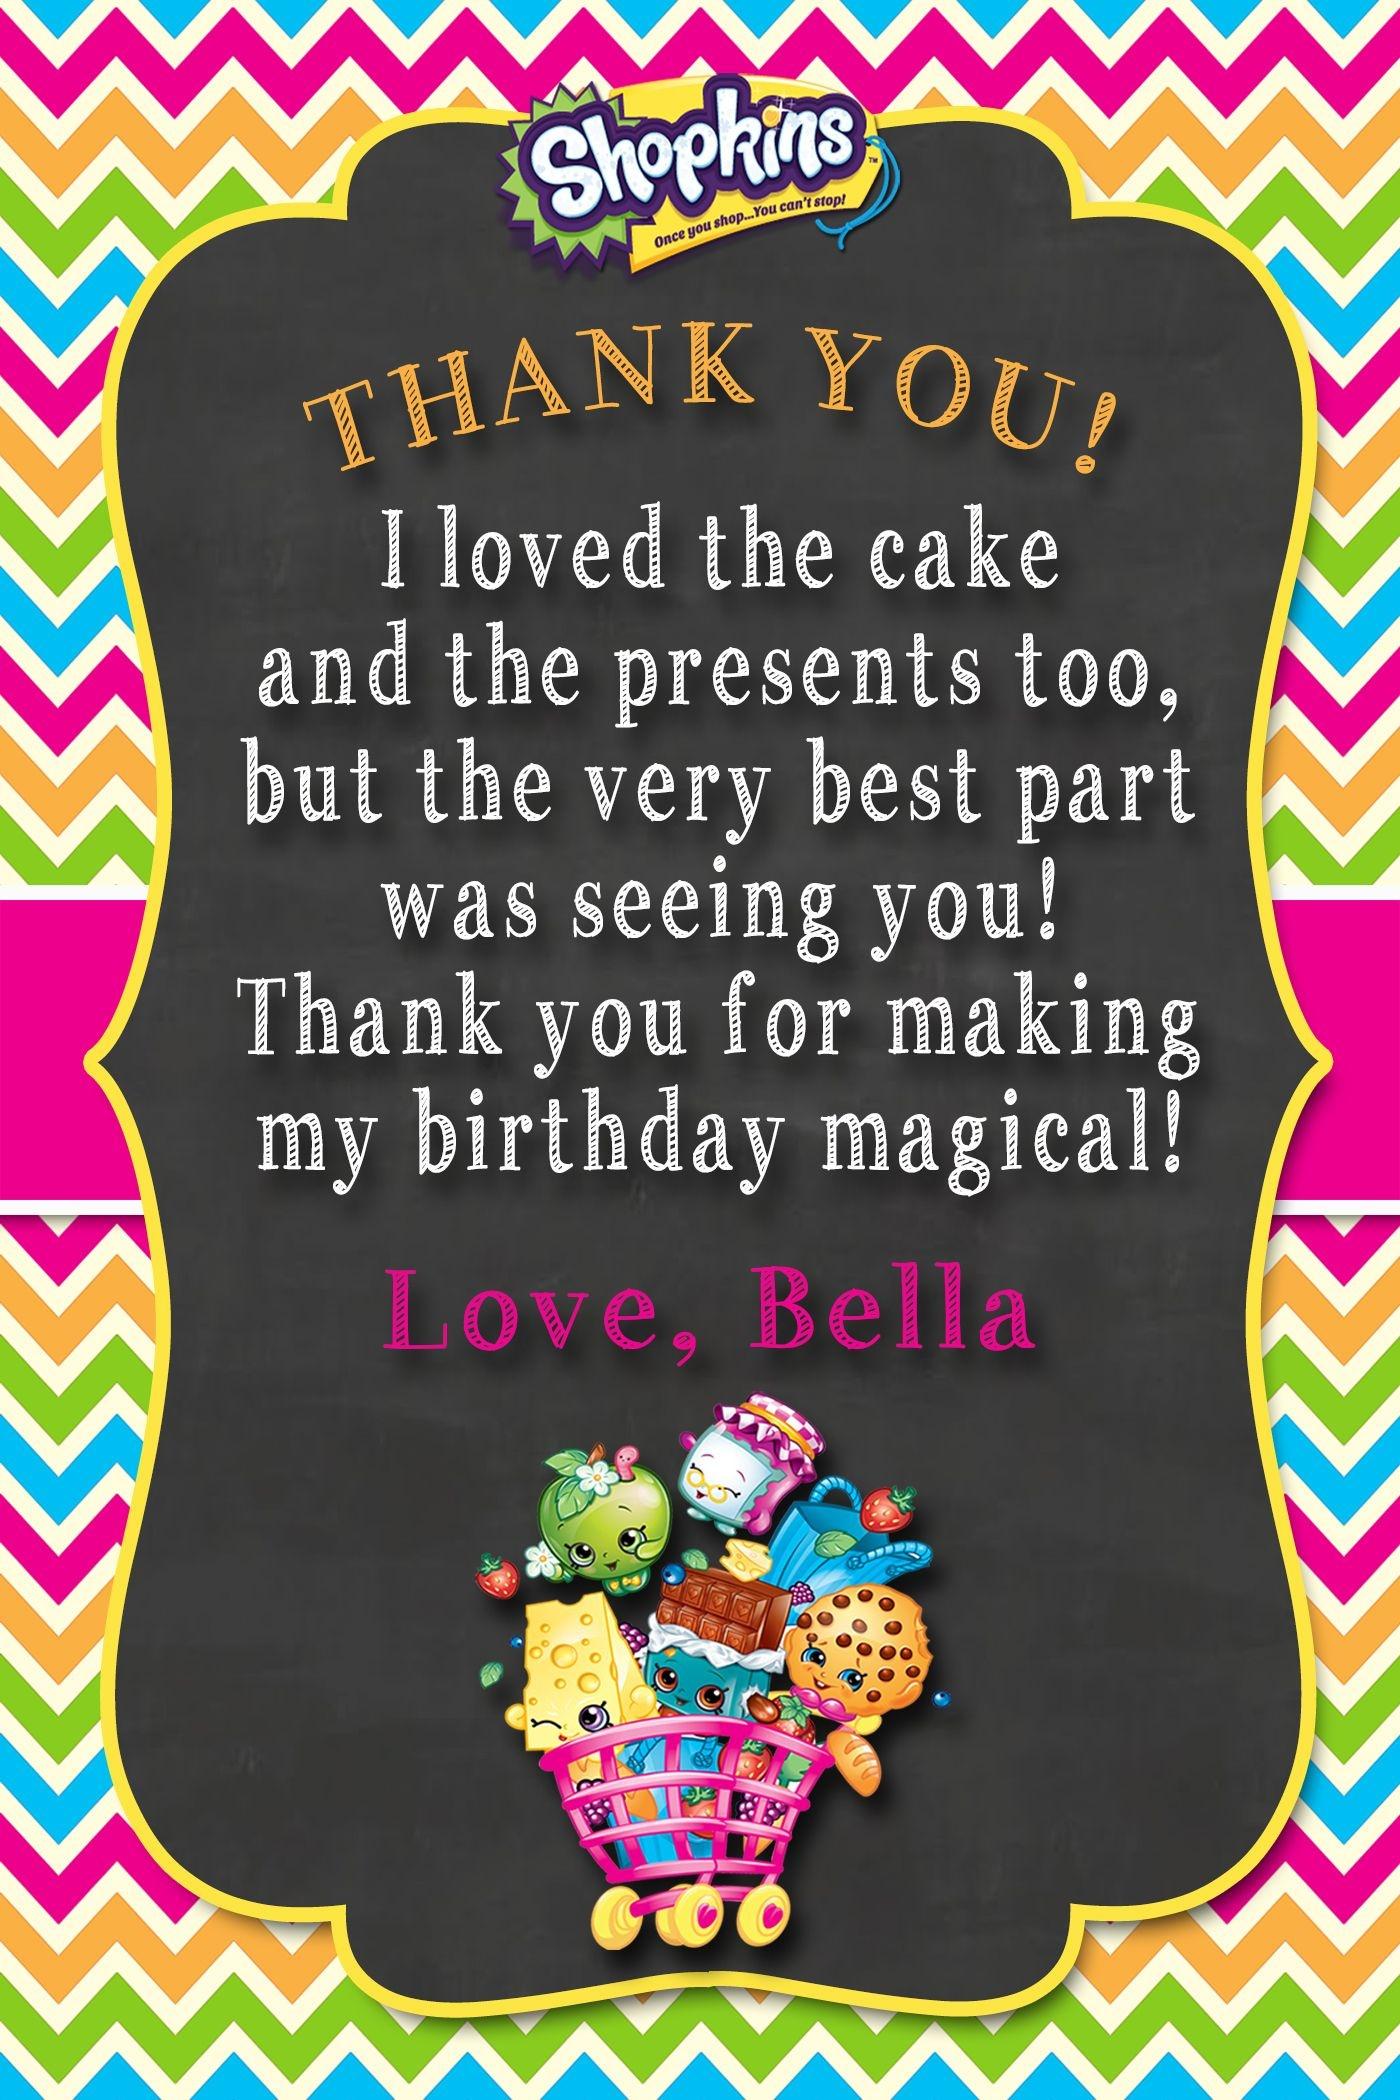 Shopkins Thank You Card | Shopkins 4 My Bianca! In 2019 | Shopkins - Free Printable Shopkins Thank You Cards